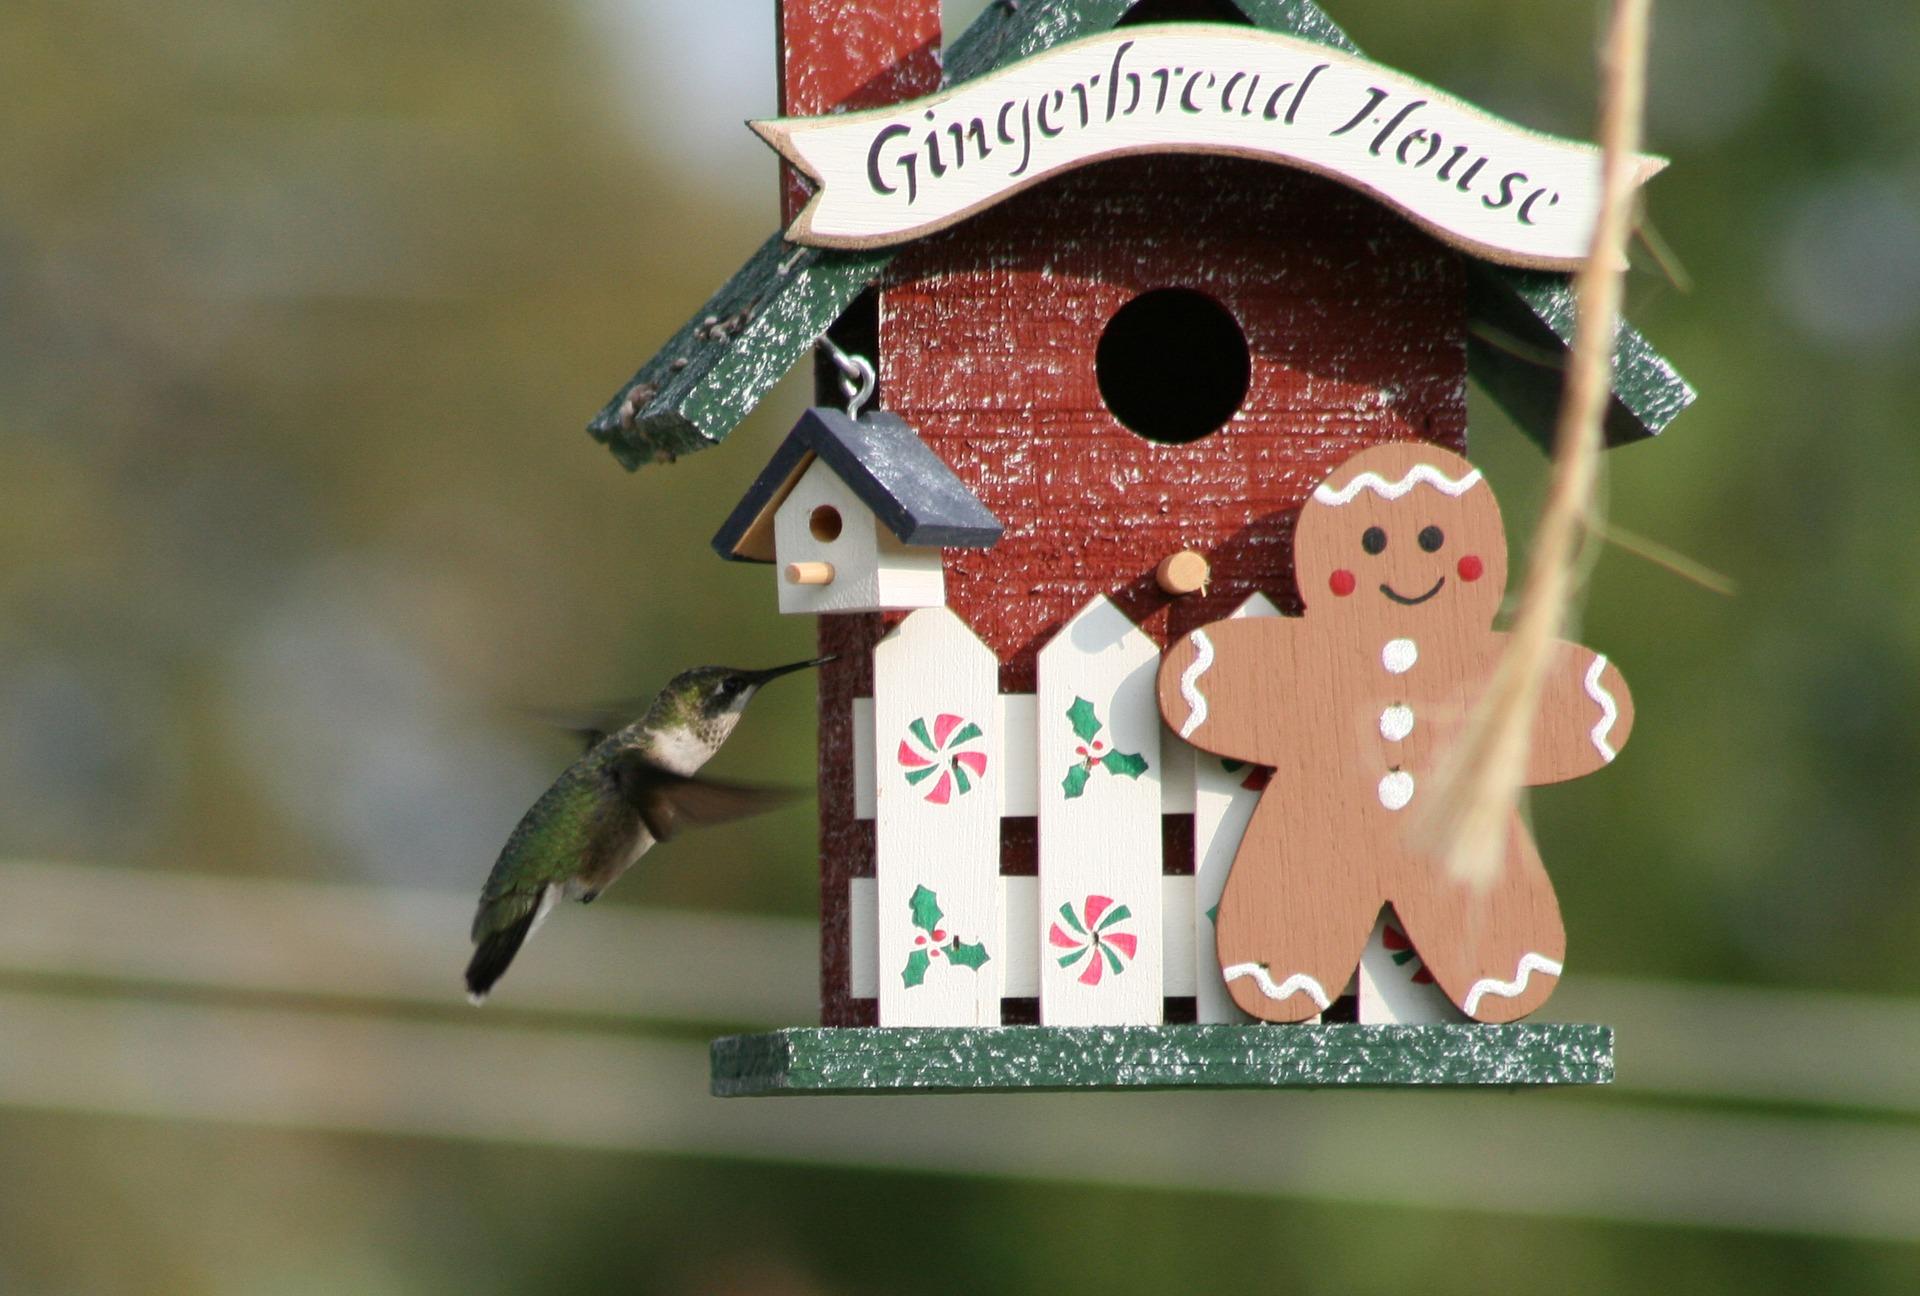 Making Real Estate Fun: Pitfalls Of Homeowner's Insurance (Jonathan Twitty)